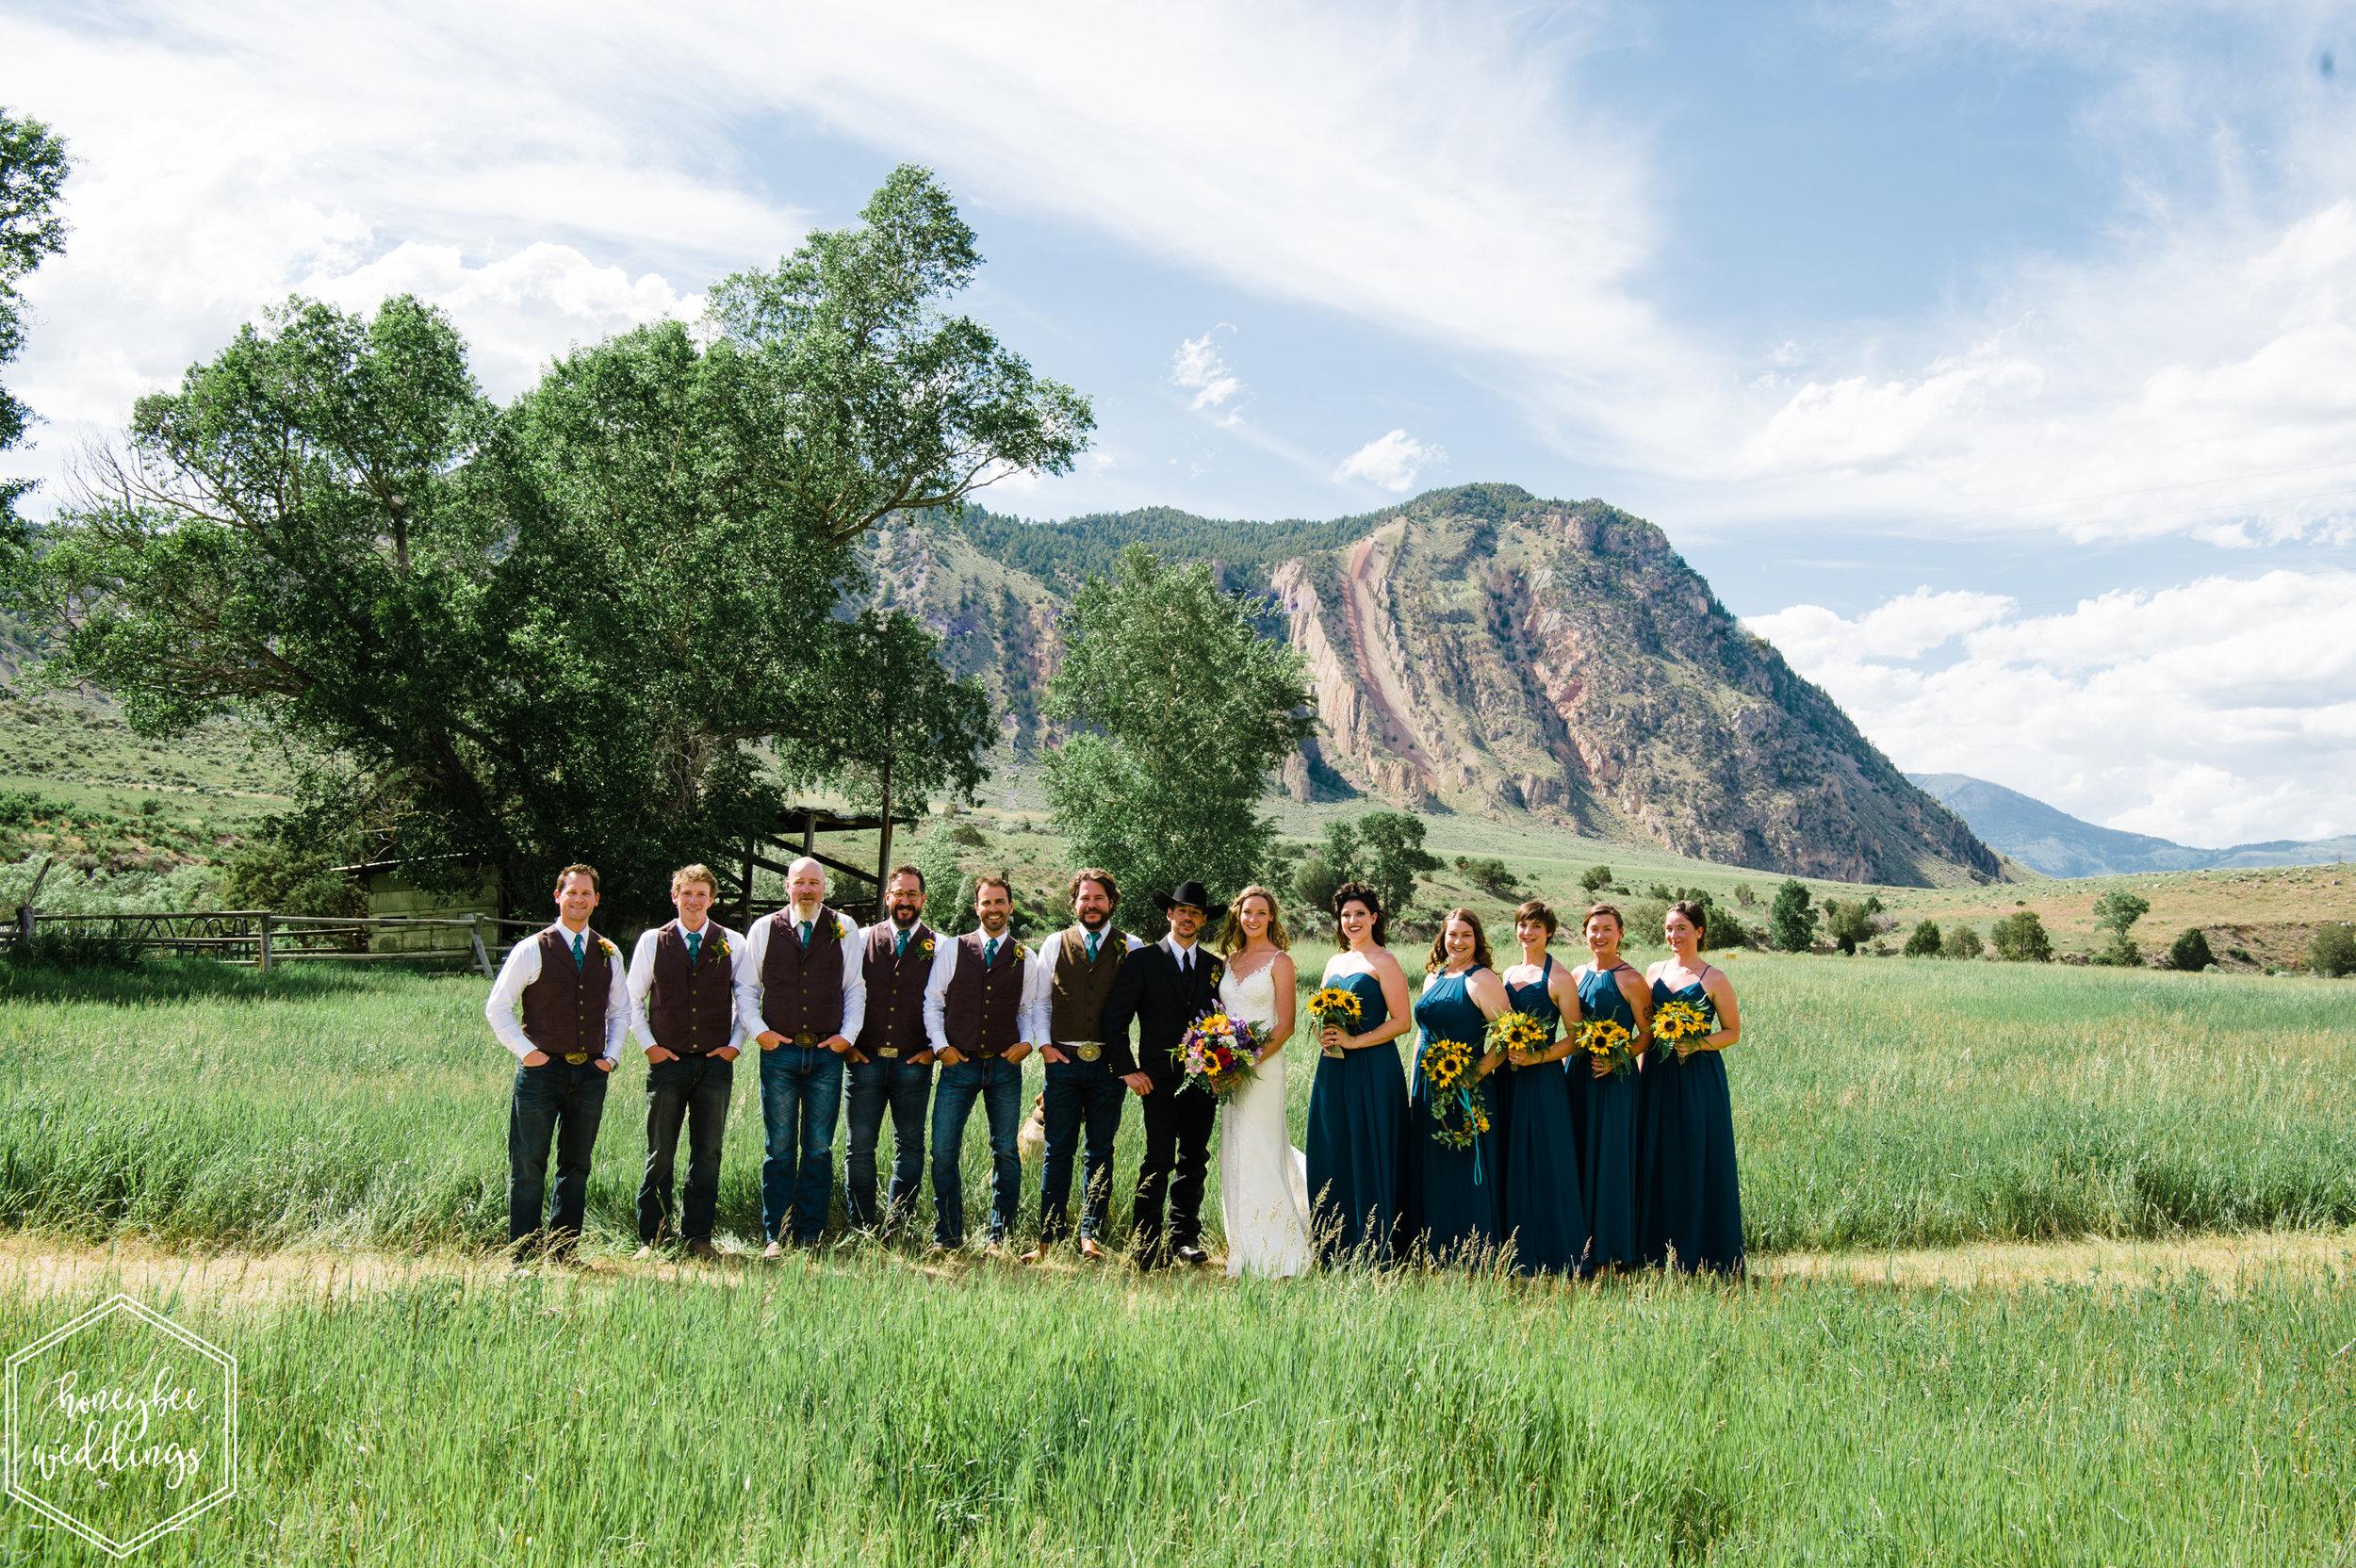 073Yellowstone National Park Wedding_Montana Wedding Photographer_Honeybee Weddings_Shannon & Jonathan_June 29, 2019-330.jpg